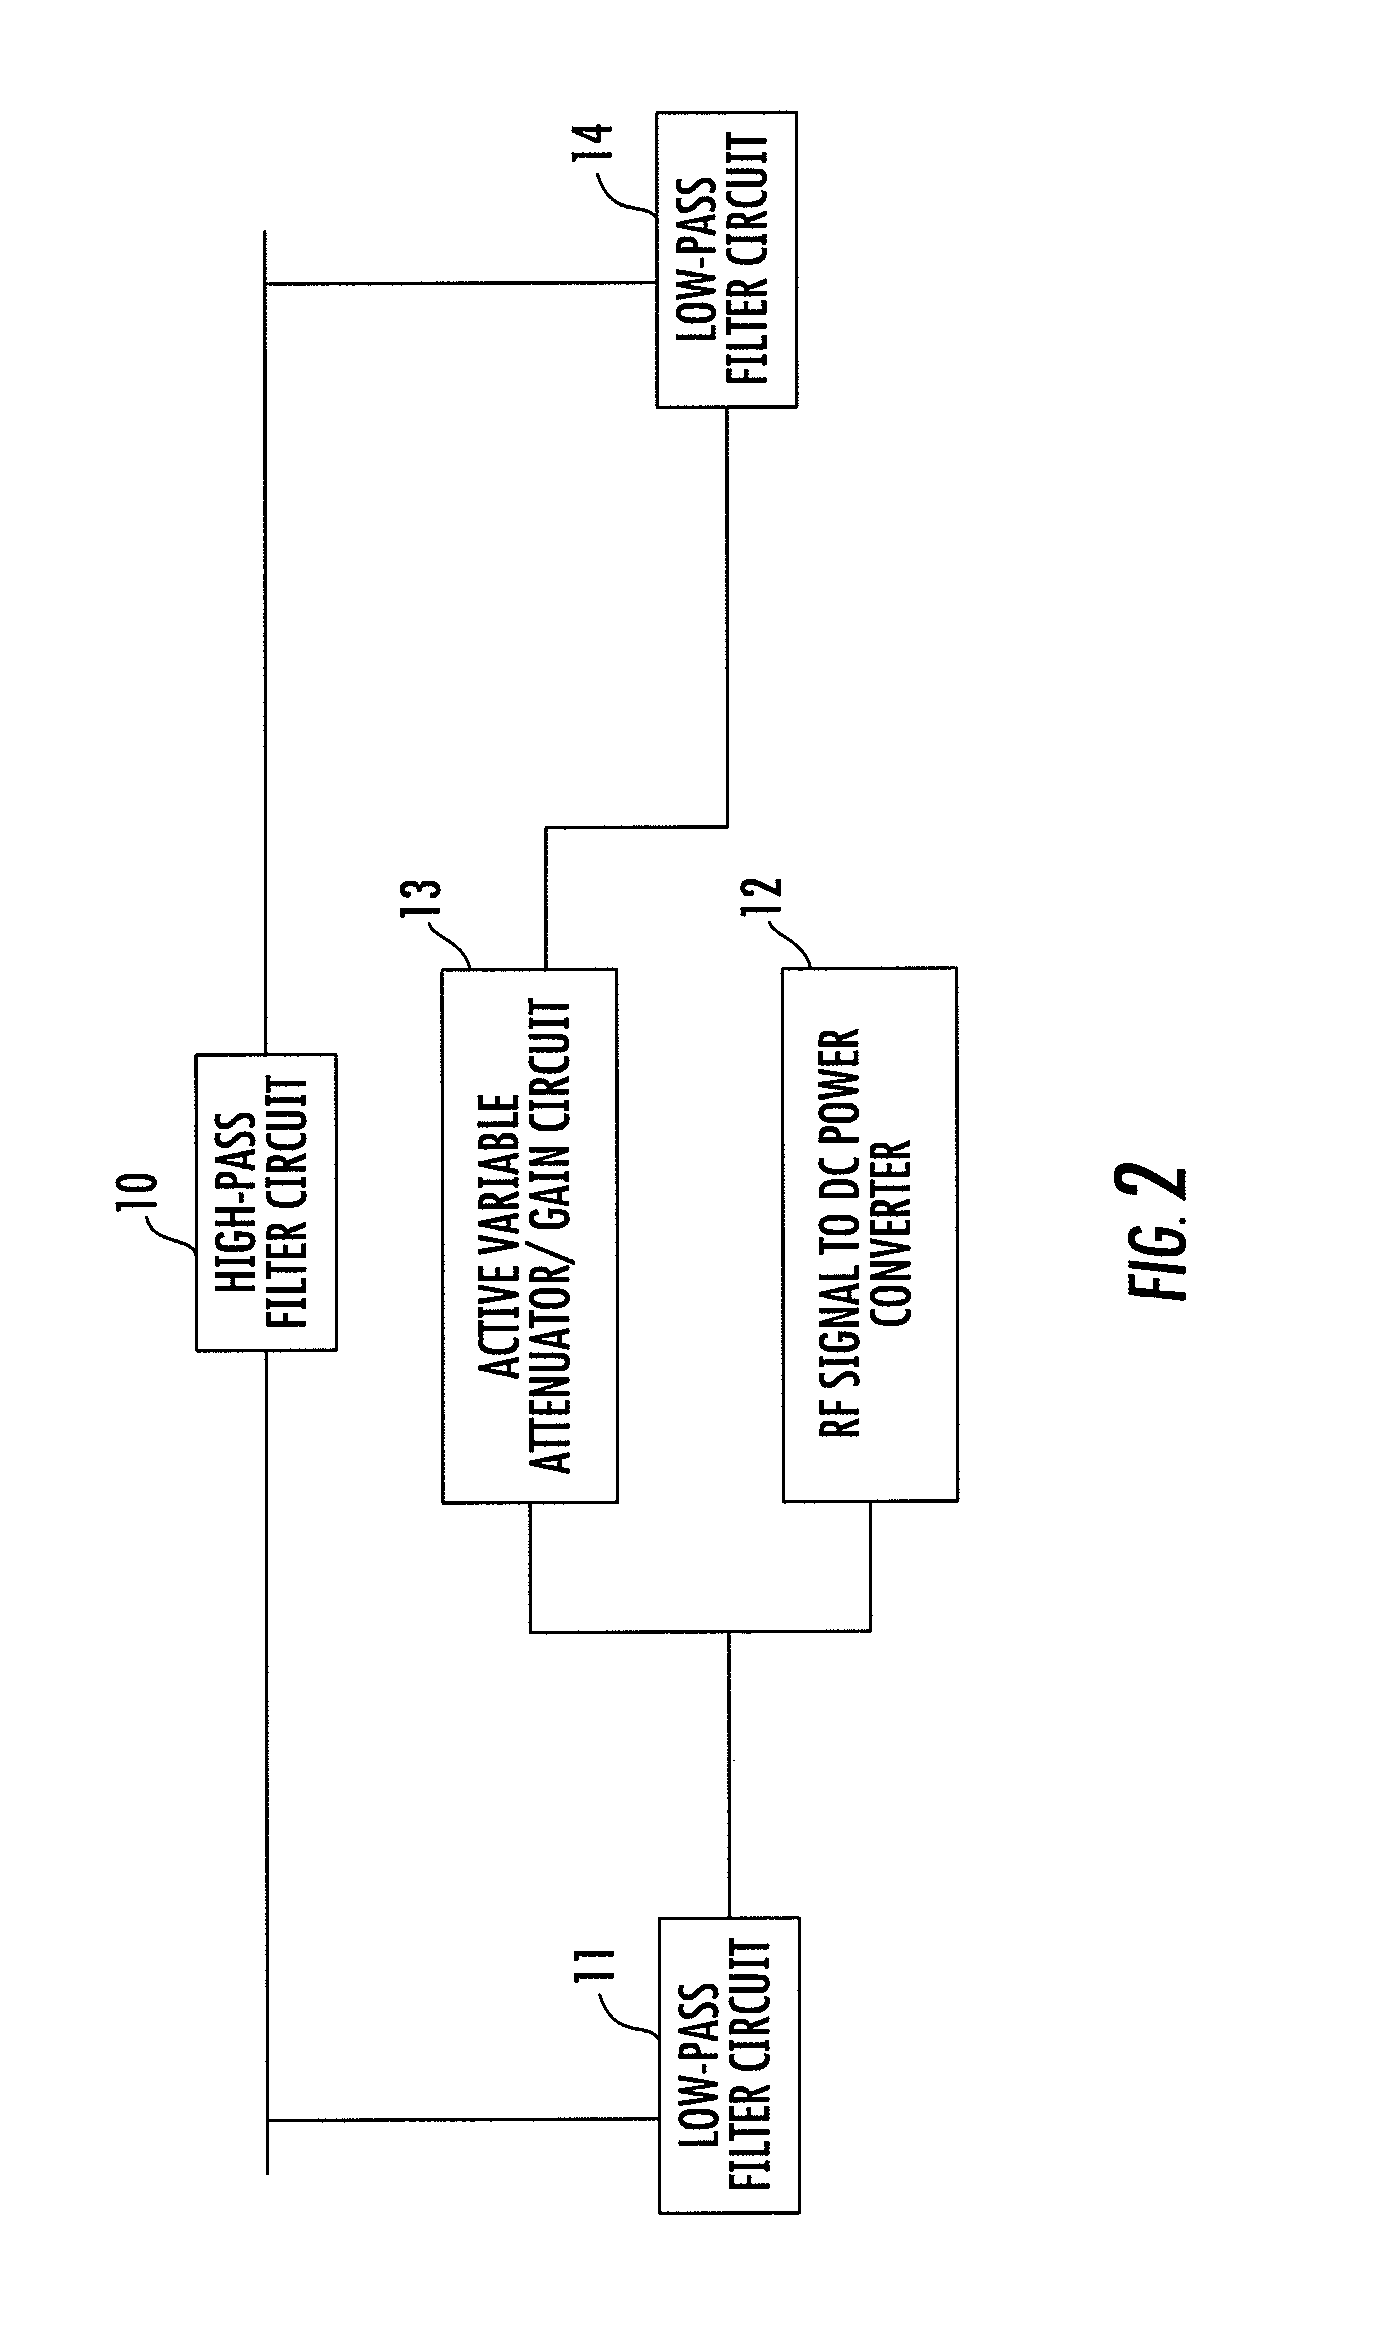 patent us20080224798 - active step attenuator